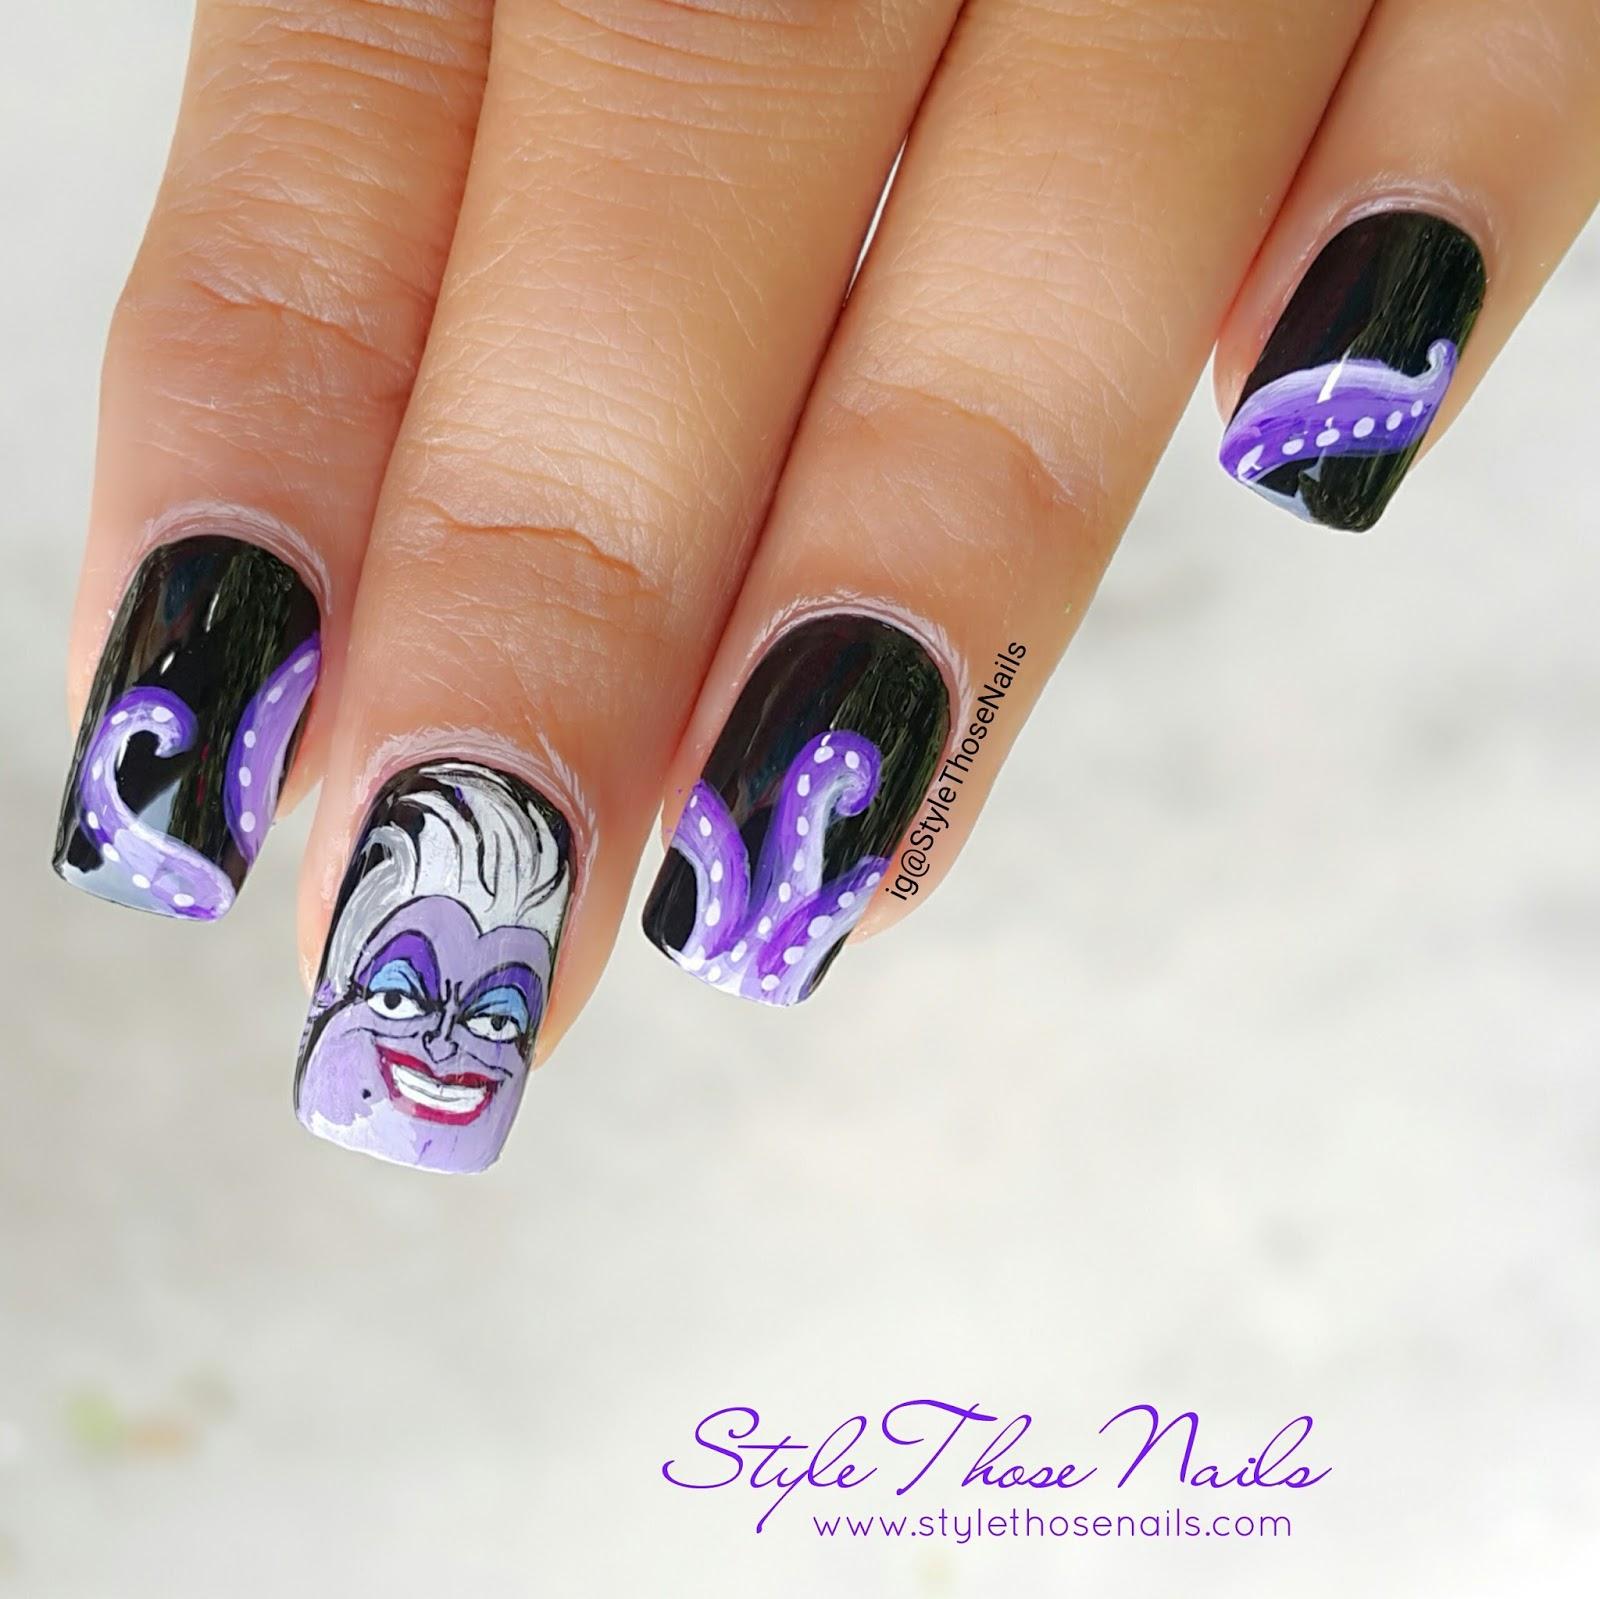 Style Those Nails Ursula Nailart Video Tutorial Teamnailvillain